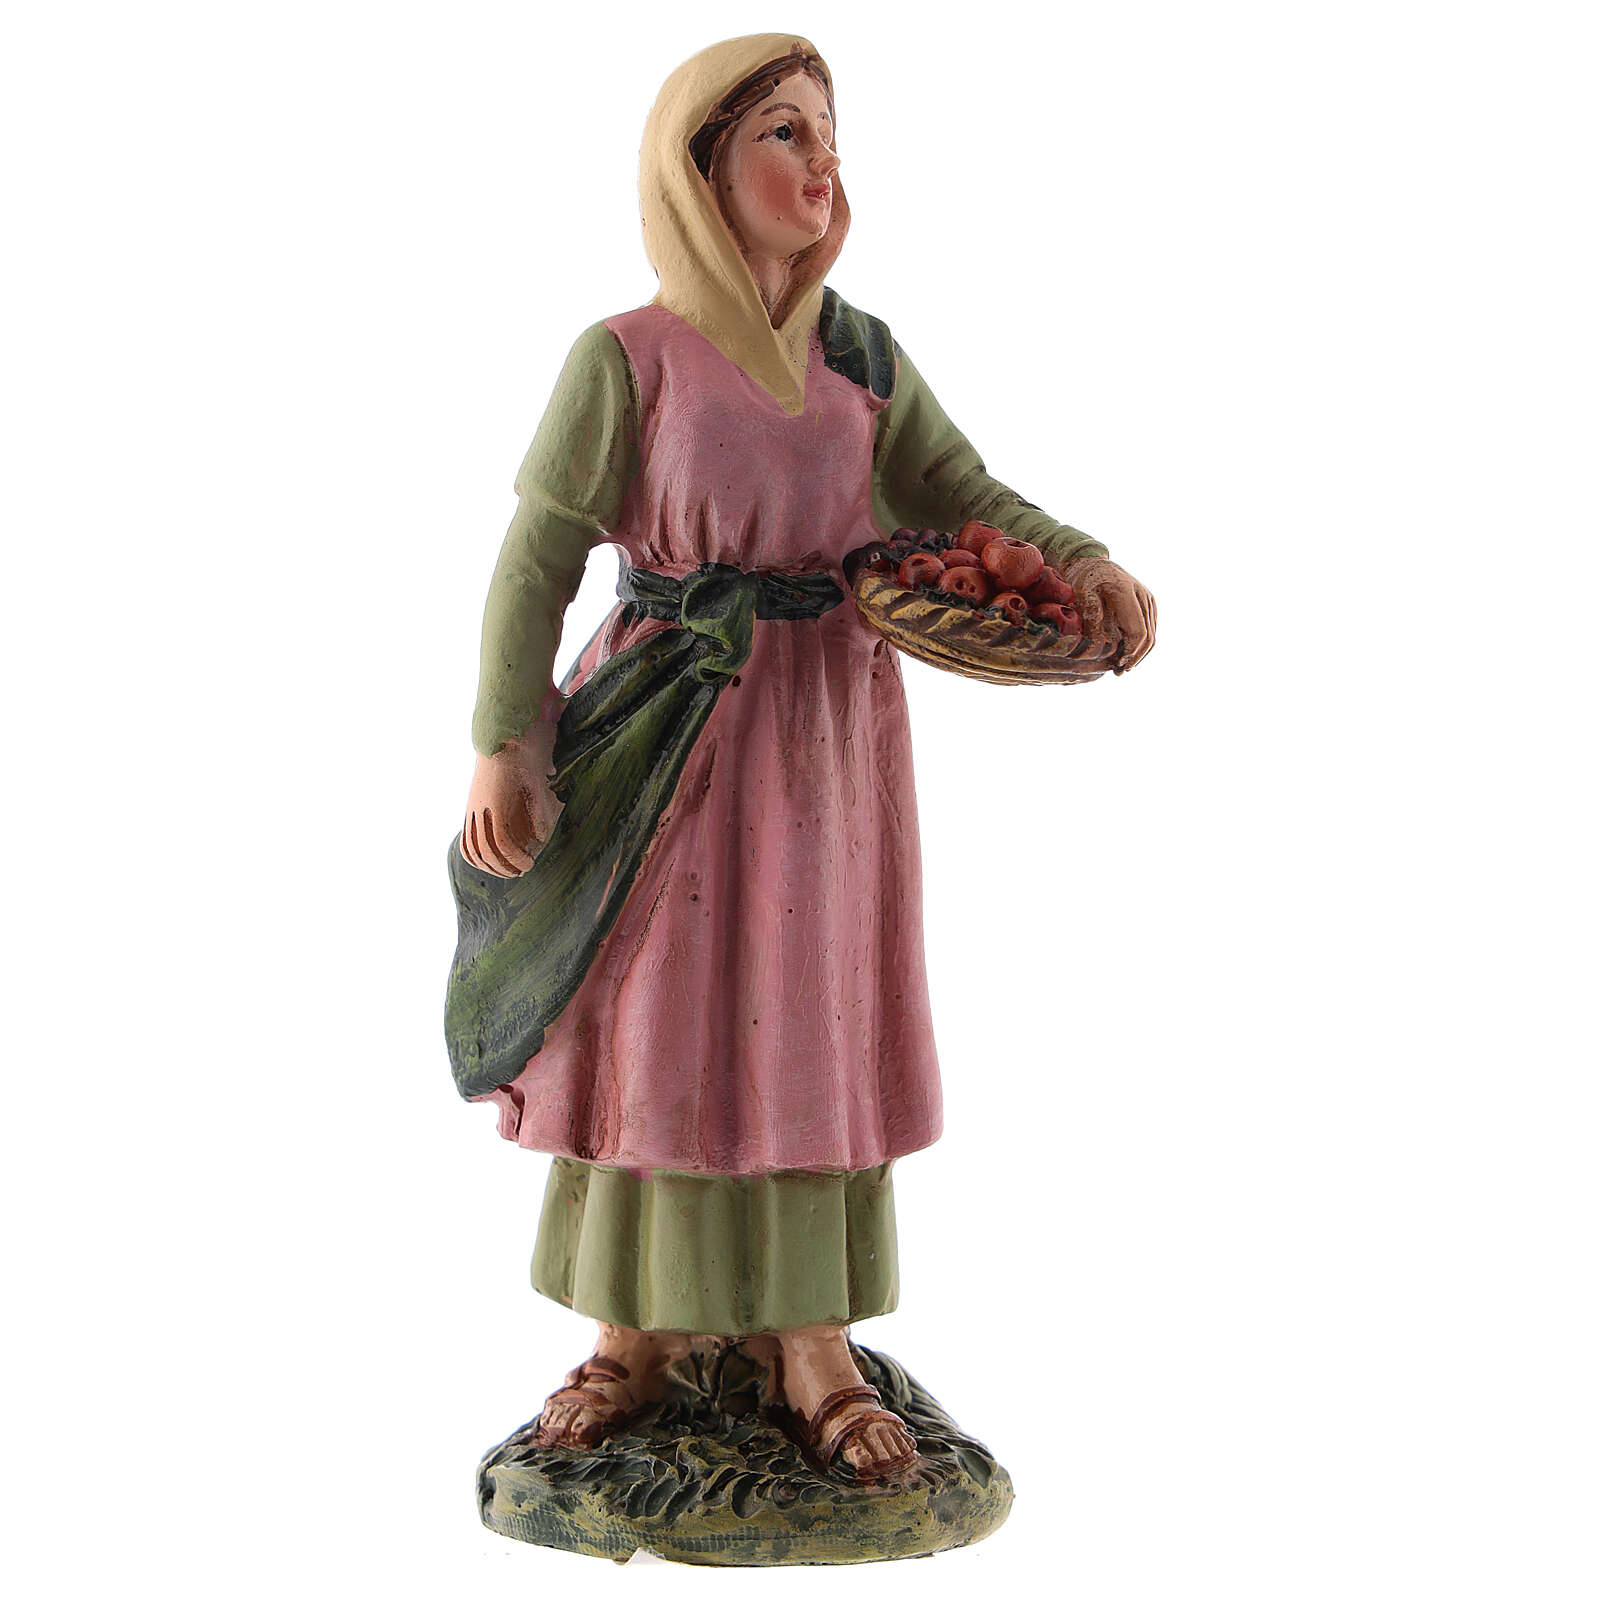 Statua presepe 10 cm pastorella cesto frutta resina linea M. Landi 3